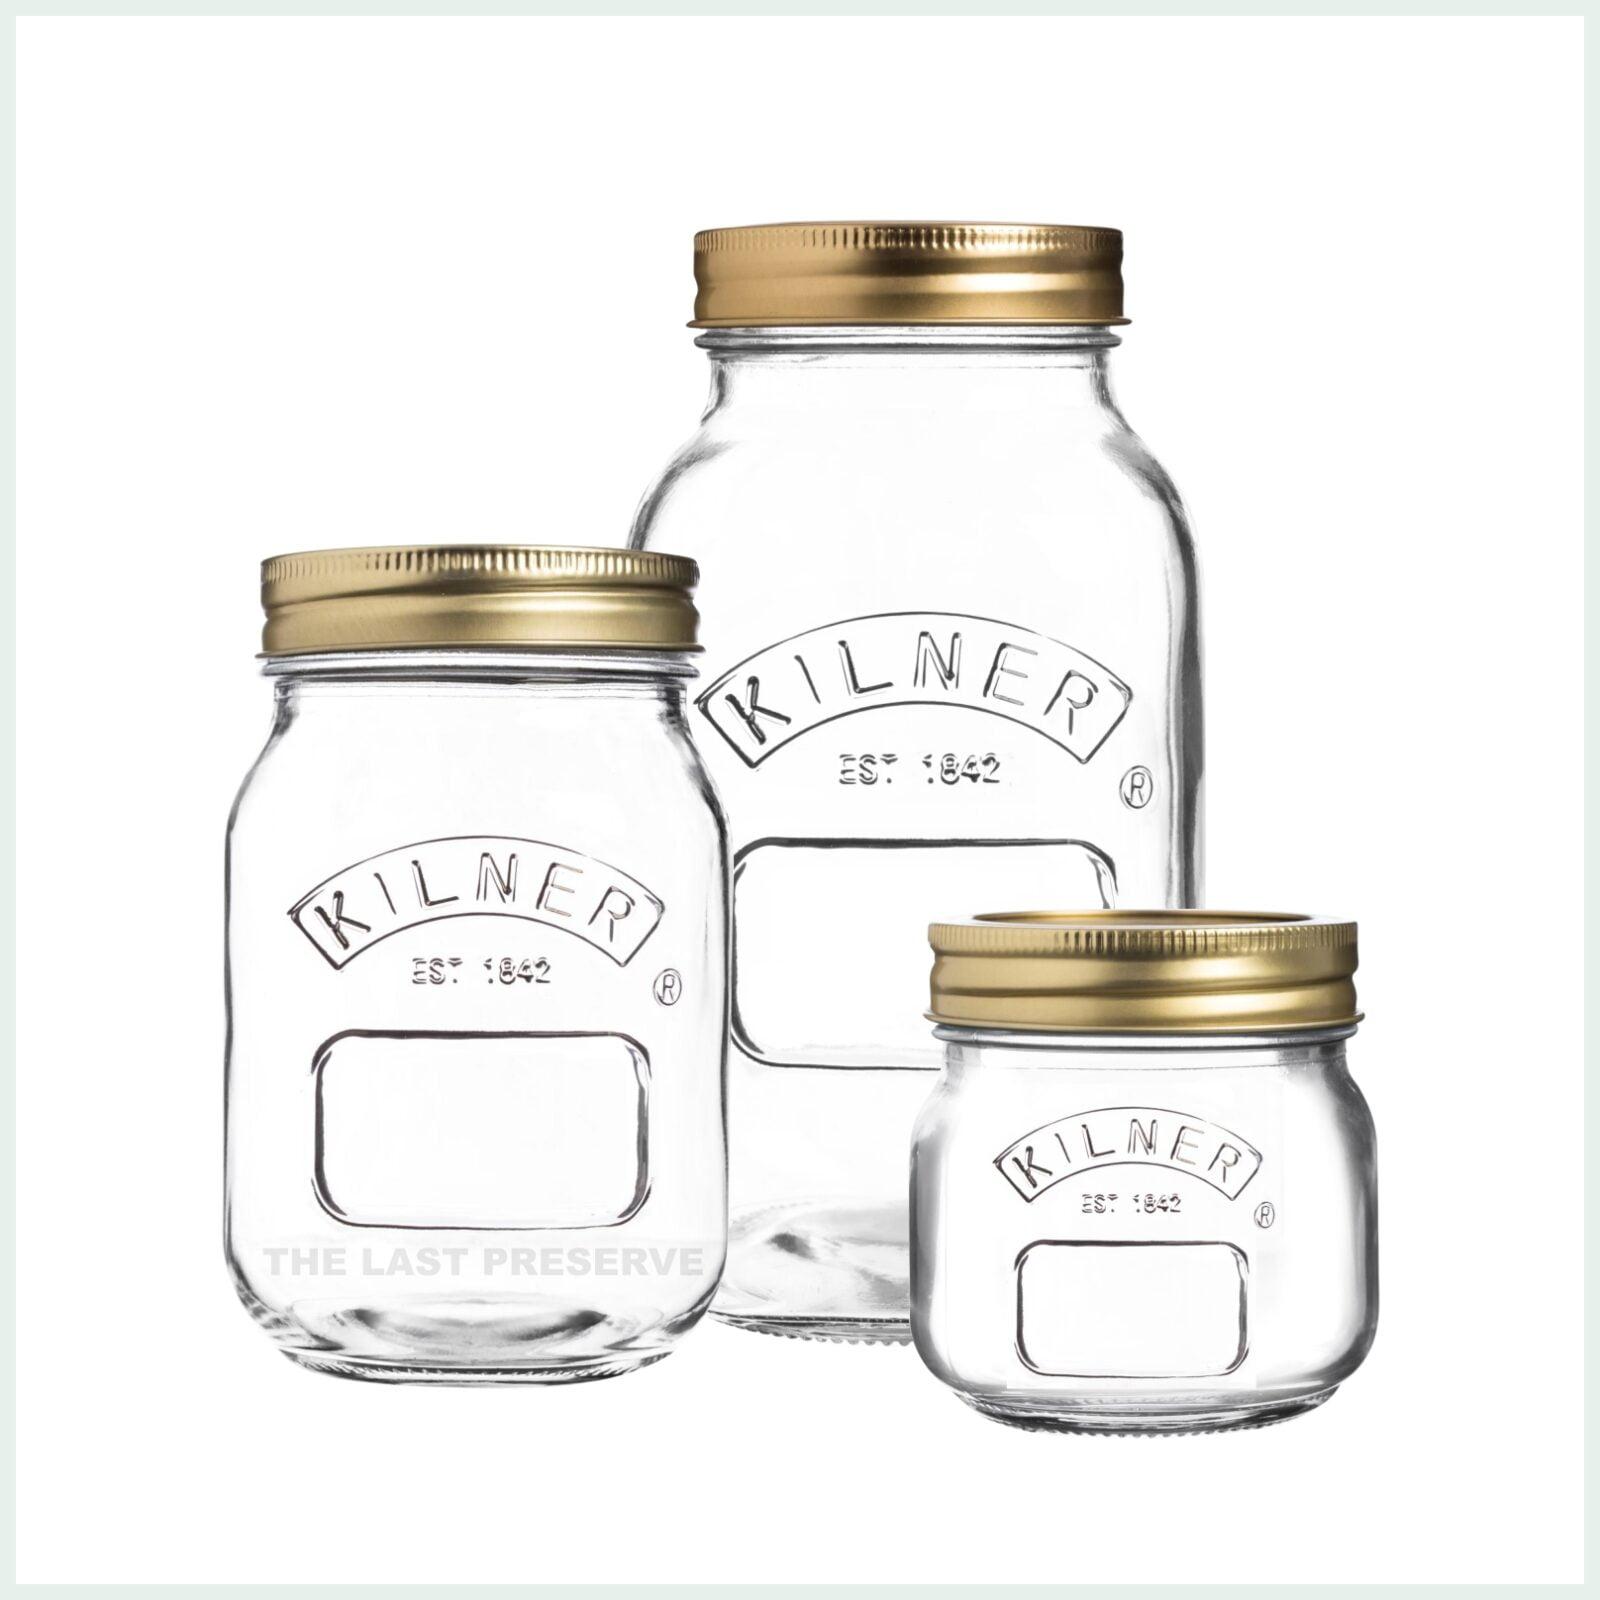 kilner screw top jars for preserving, jam making and water bath canning